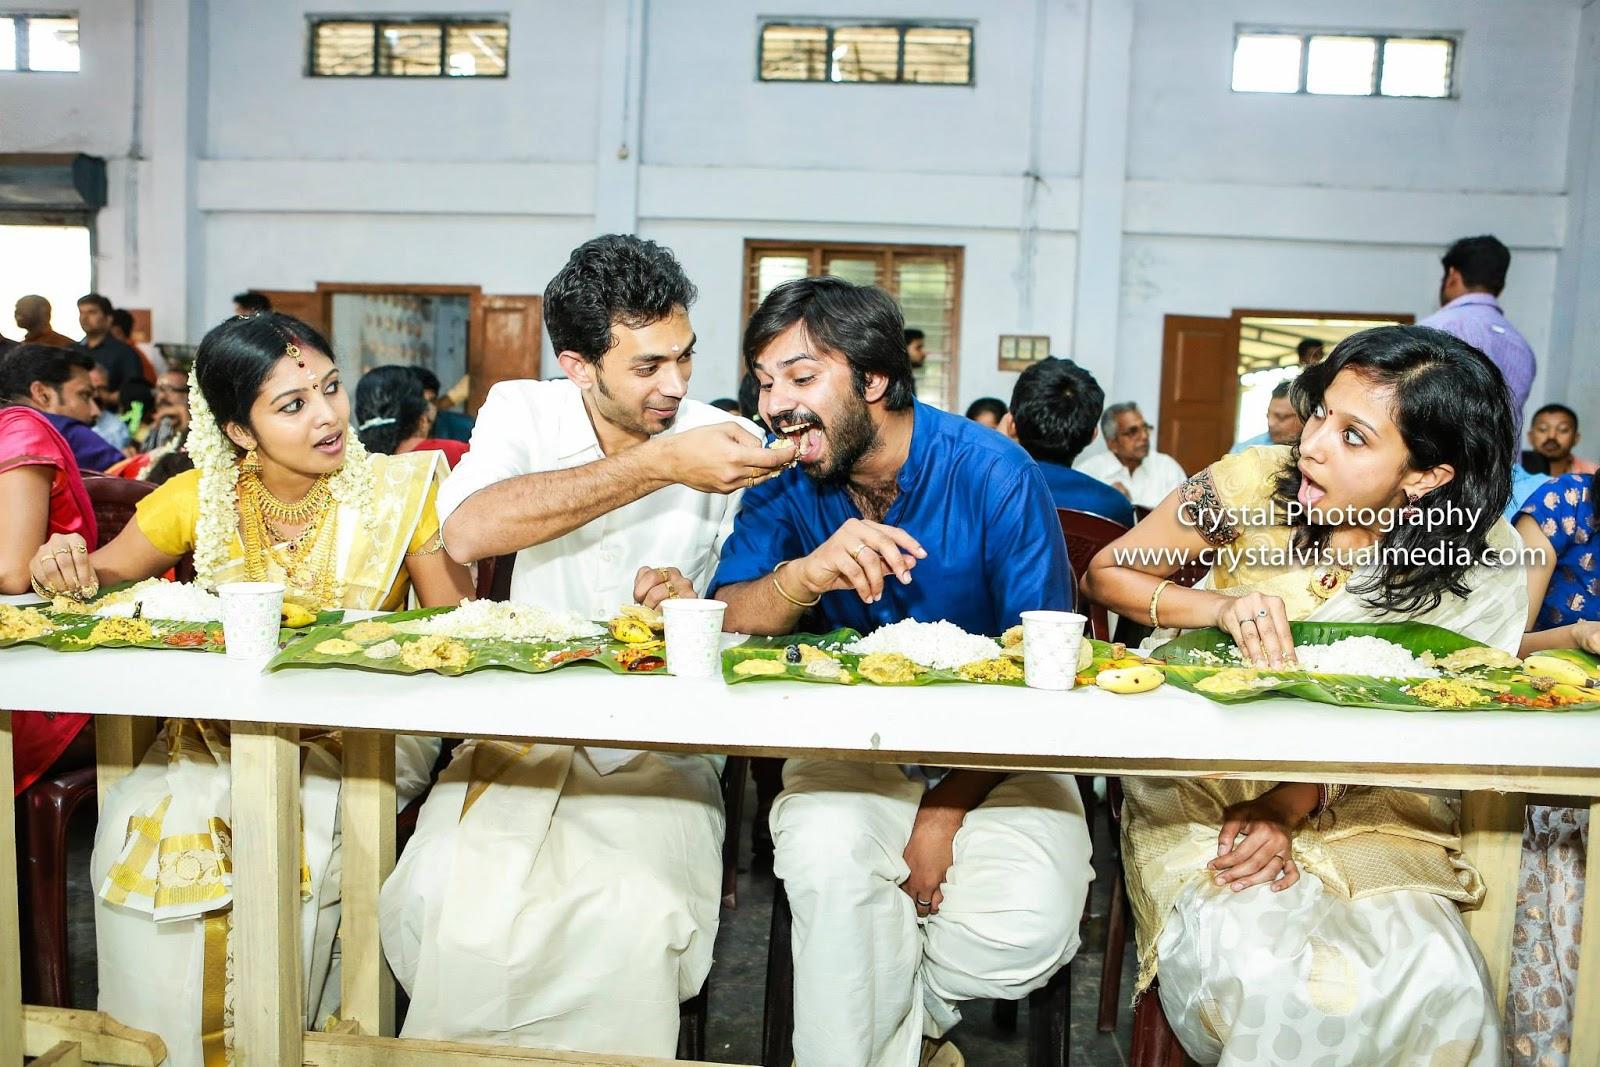 Kerala wedding photos muslim wedding photos wedding kerala wedding - Kerala Wedding Photos